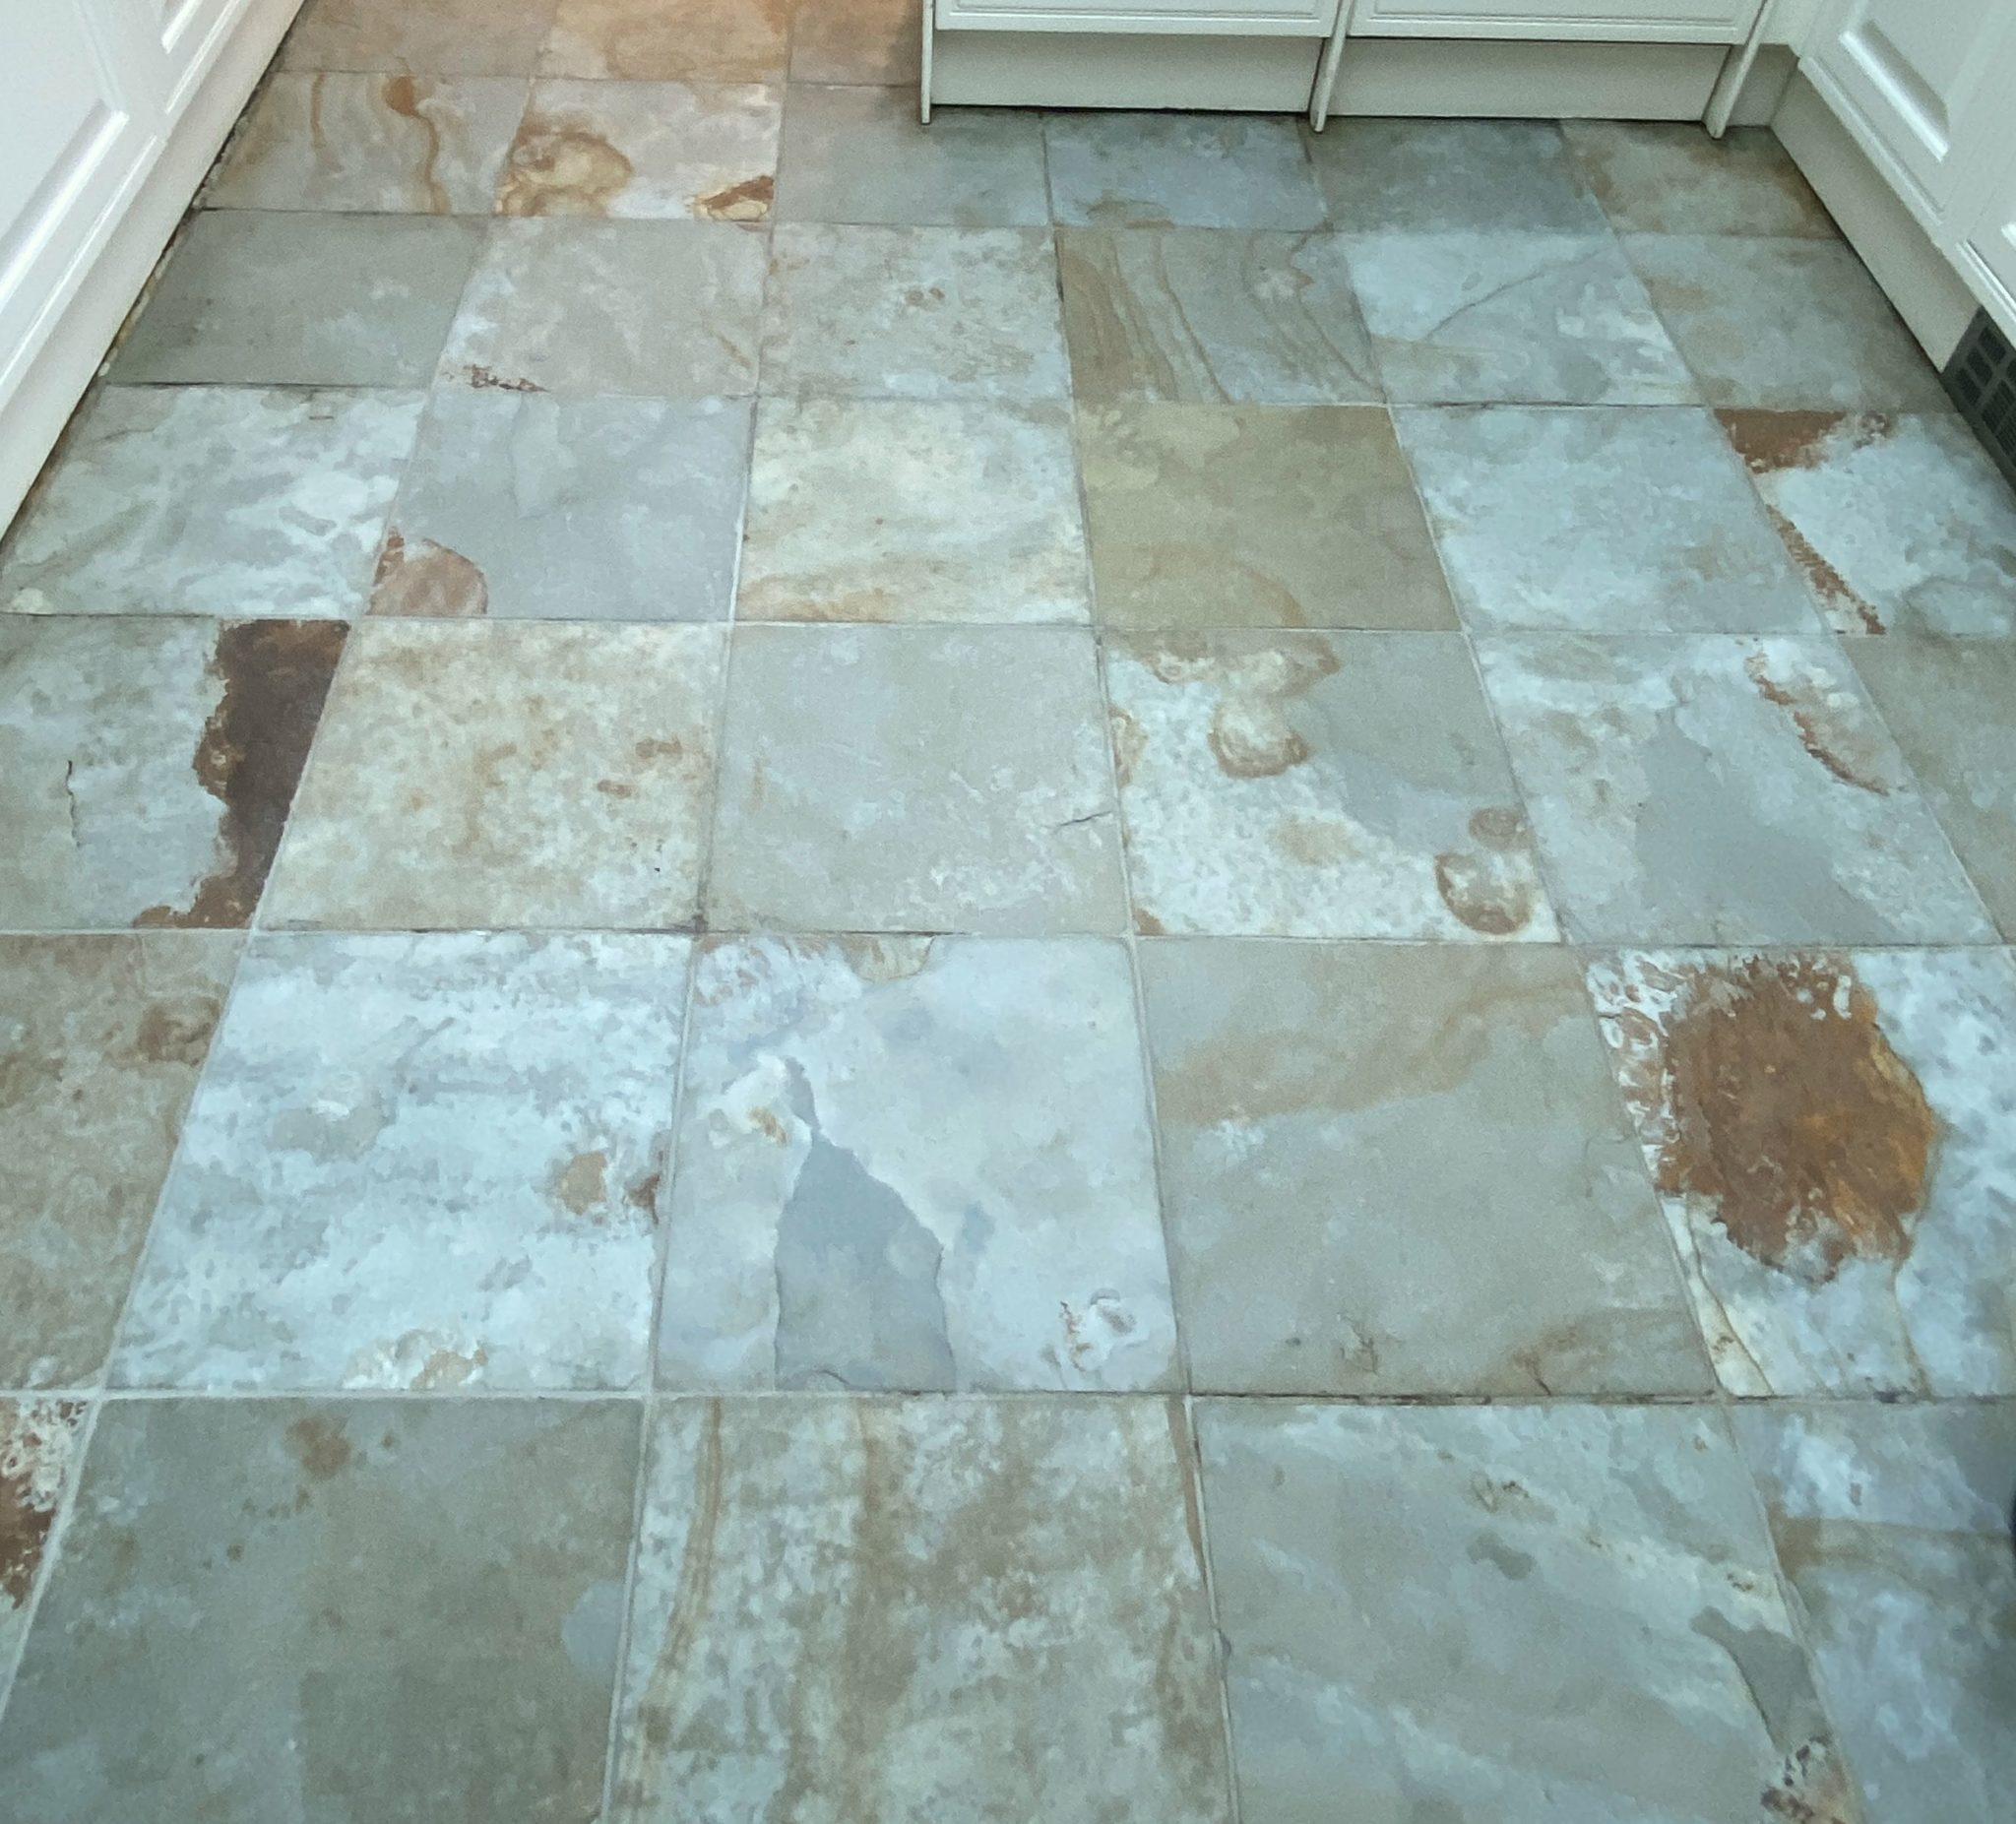 Clean slate tiles